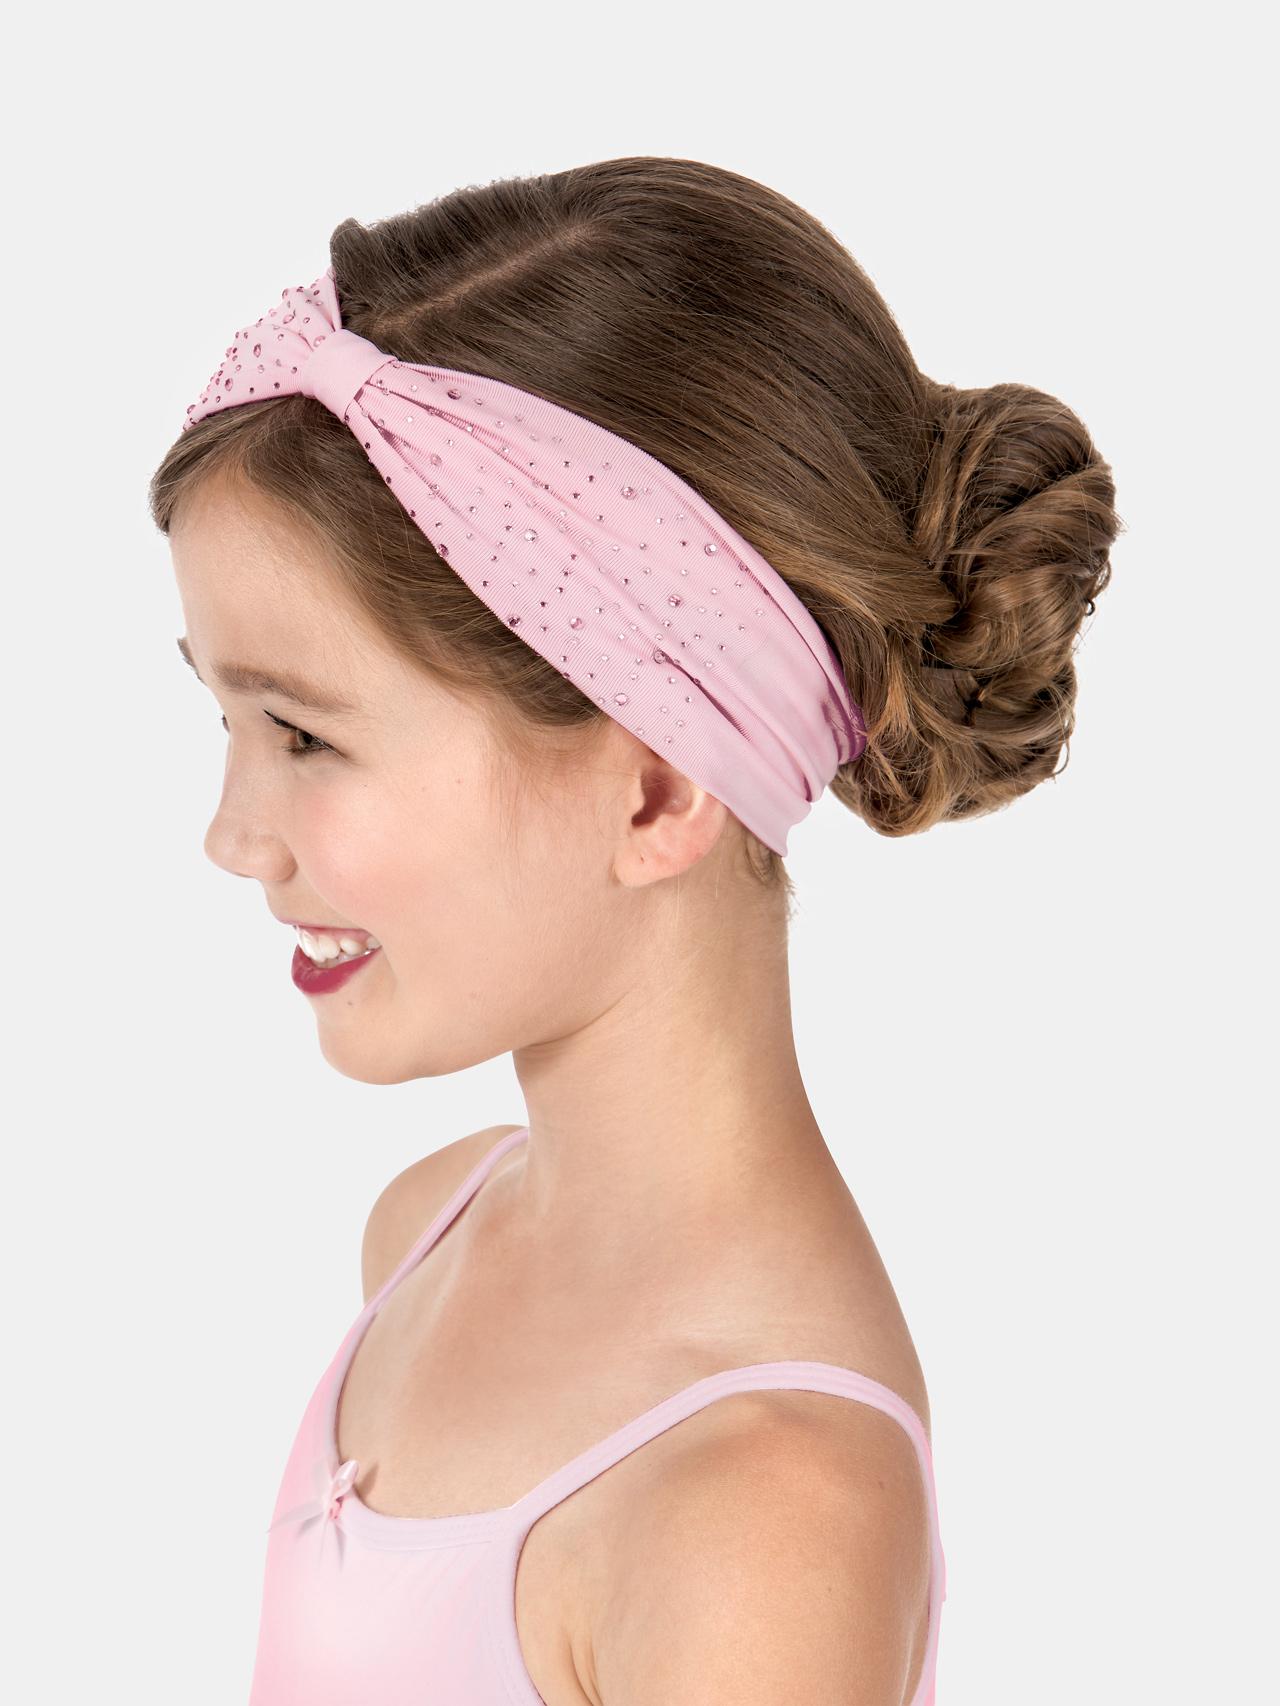 Free Shipping - Thick Rhinestone Headband by LA PETITE BALLERINA 22c3695dfab